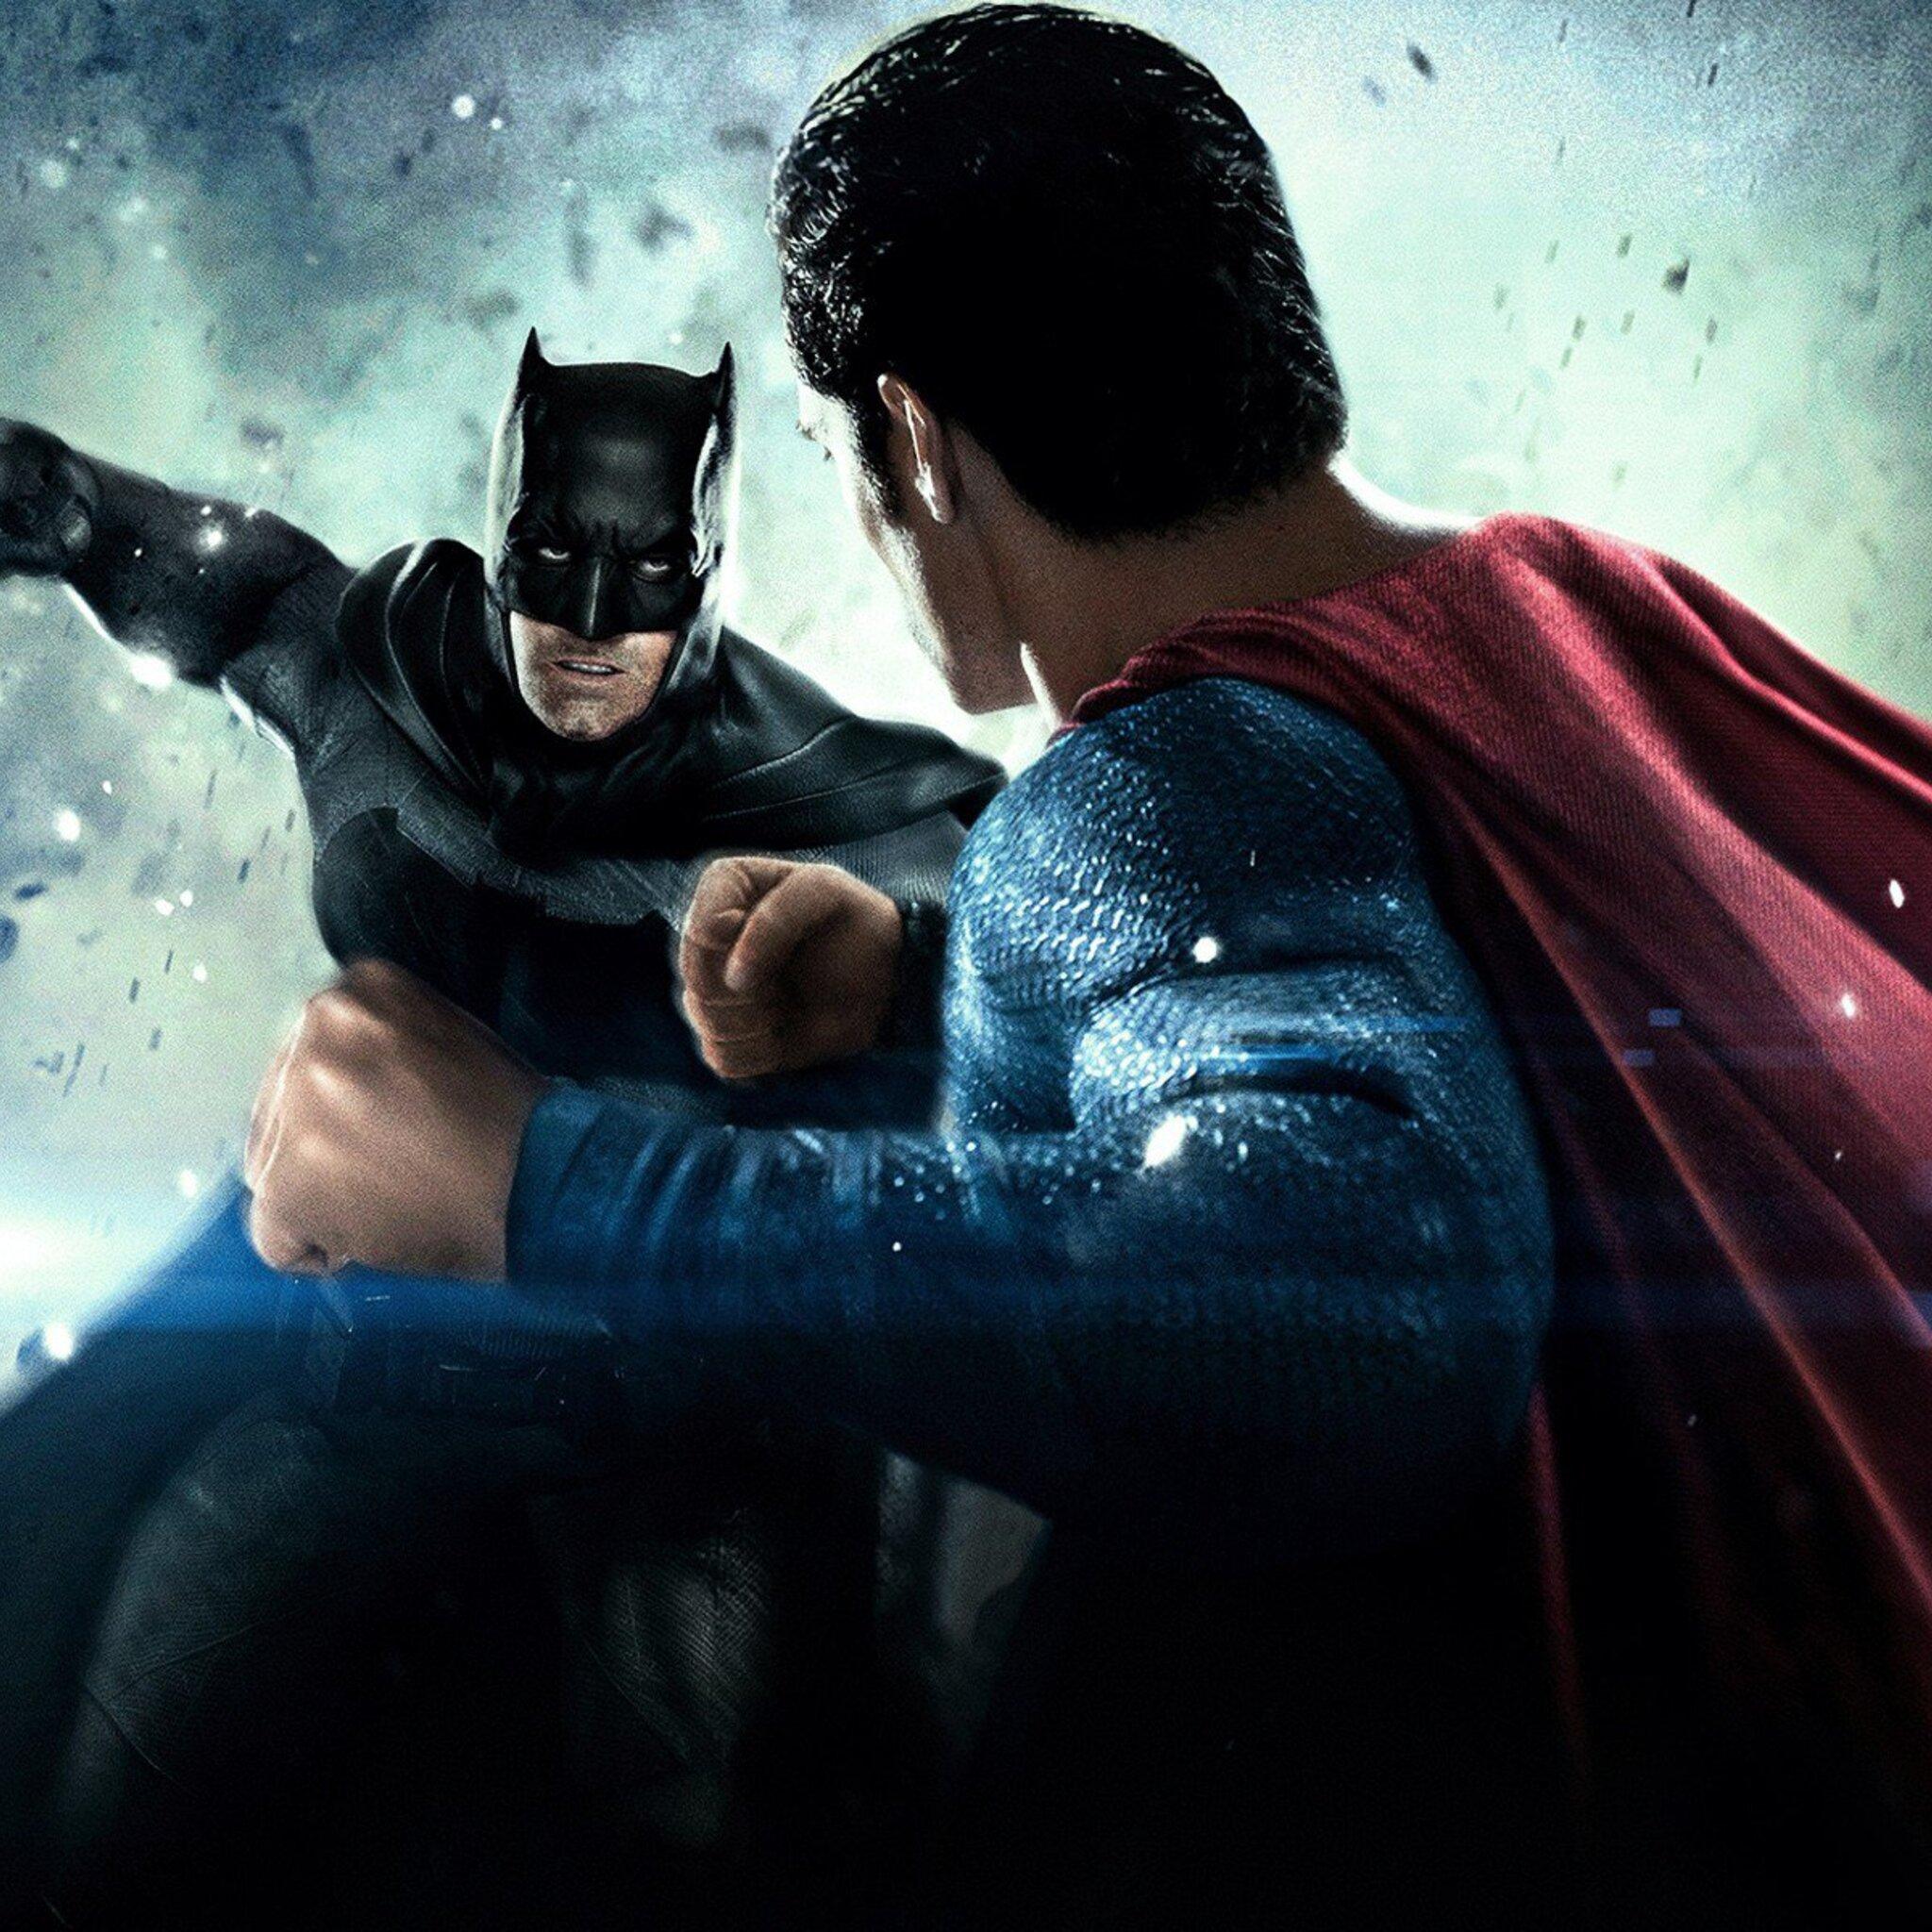 2048x2048 Hd Batman V Superman Dawn Of Justice Movie Ipad Air Hd